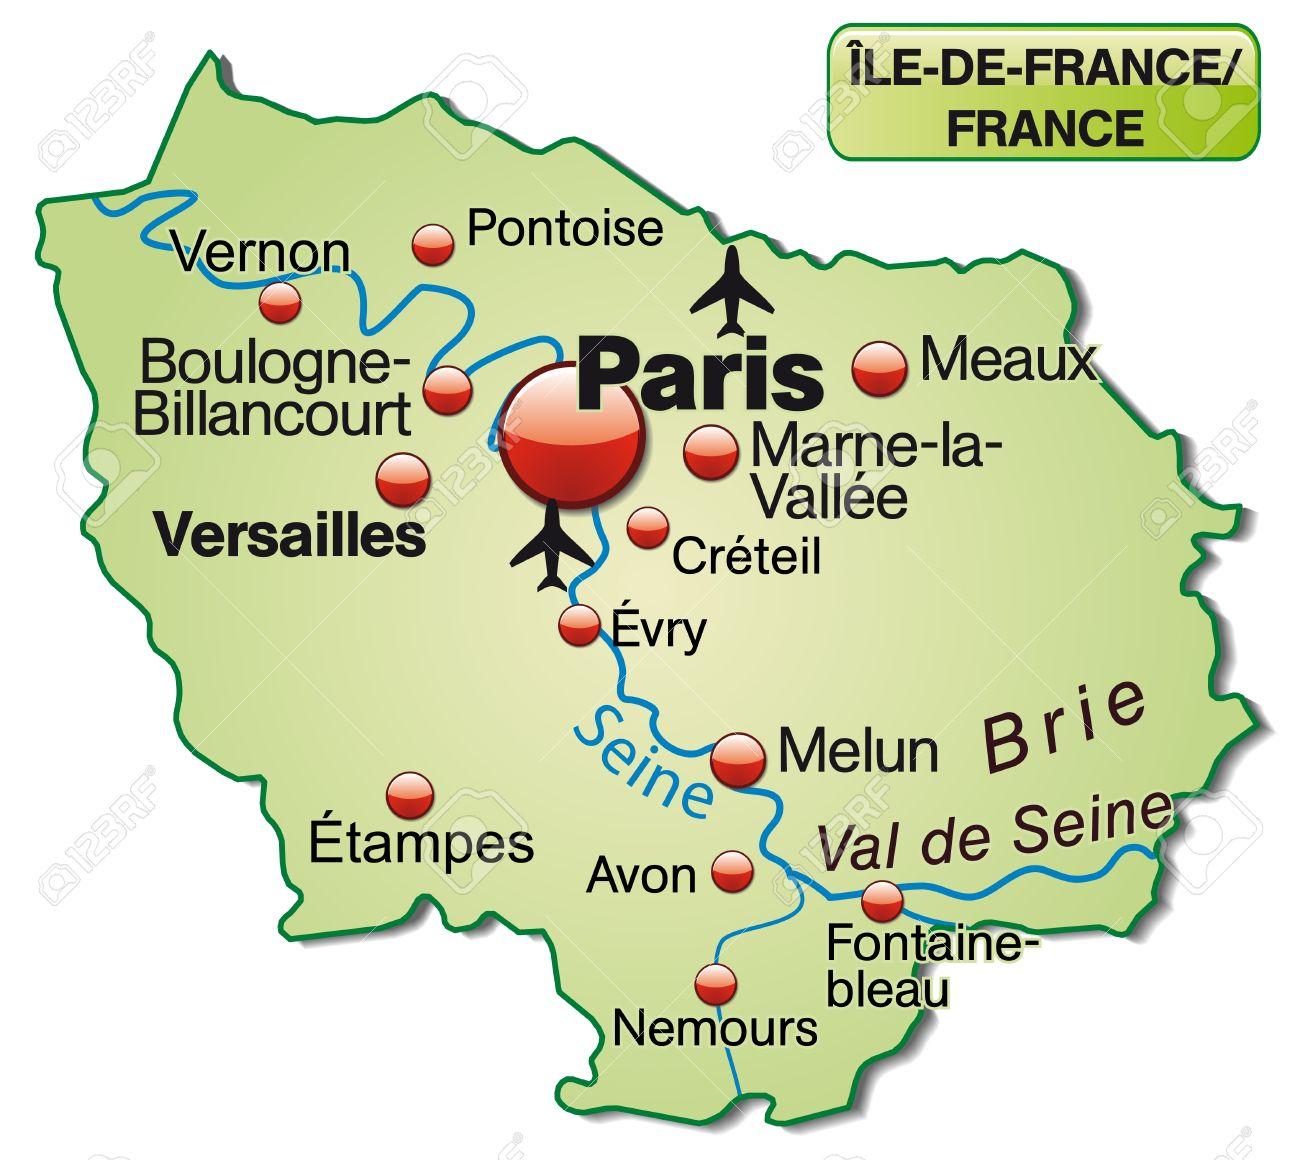 Ile De France Liberal Dictionary